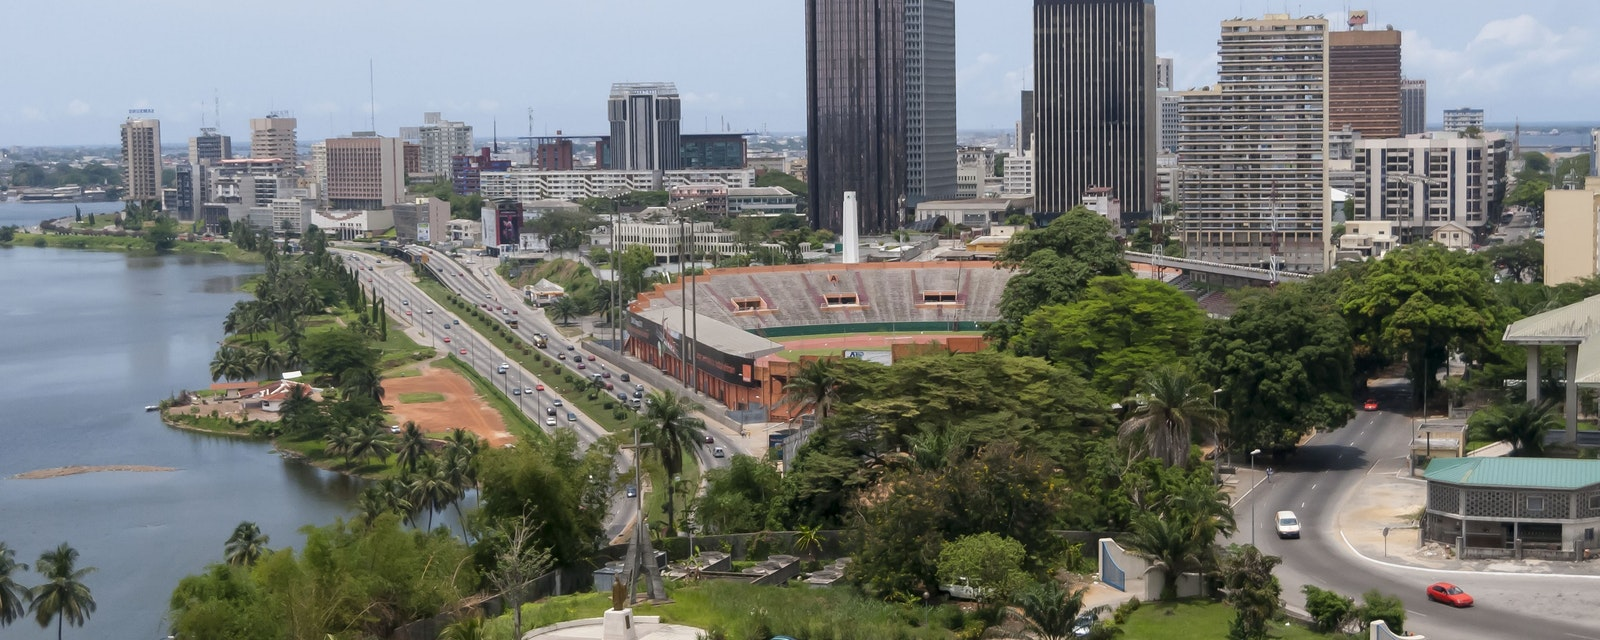 Abidjan,,Ivory,Coast,(côte,D'ivoire),,Africa.,April,2013.,Abidjan,,The